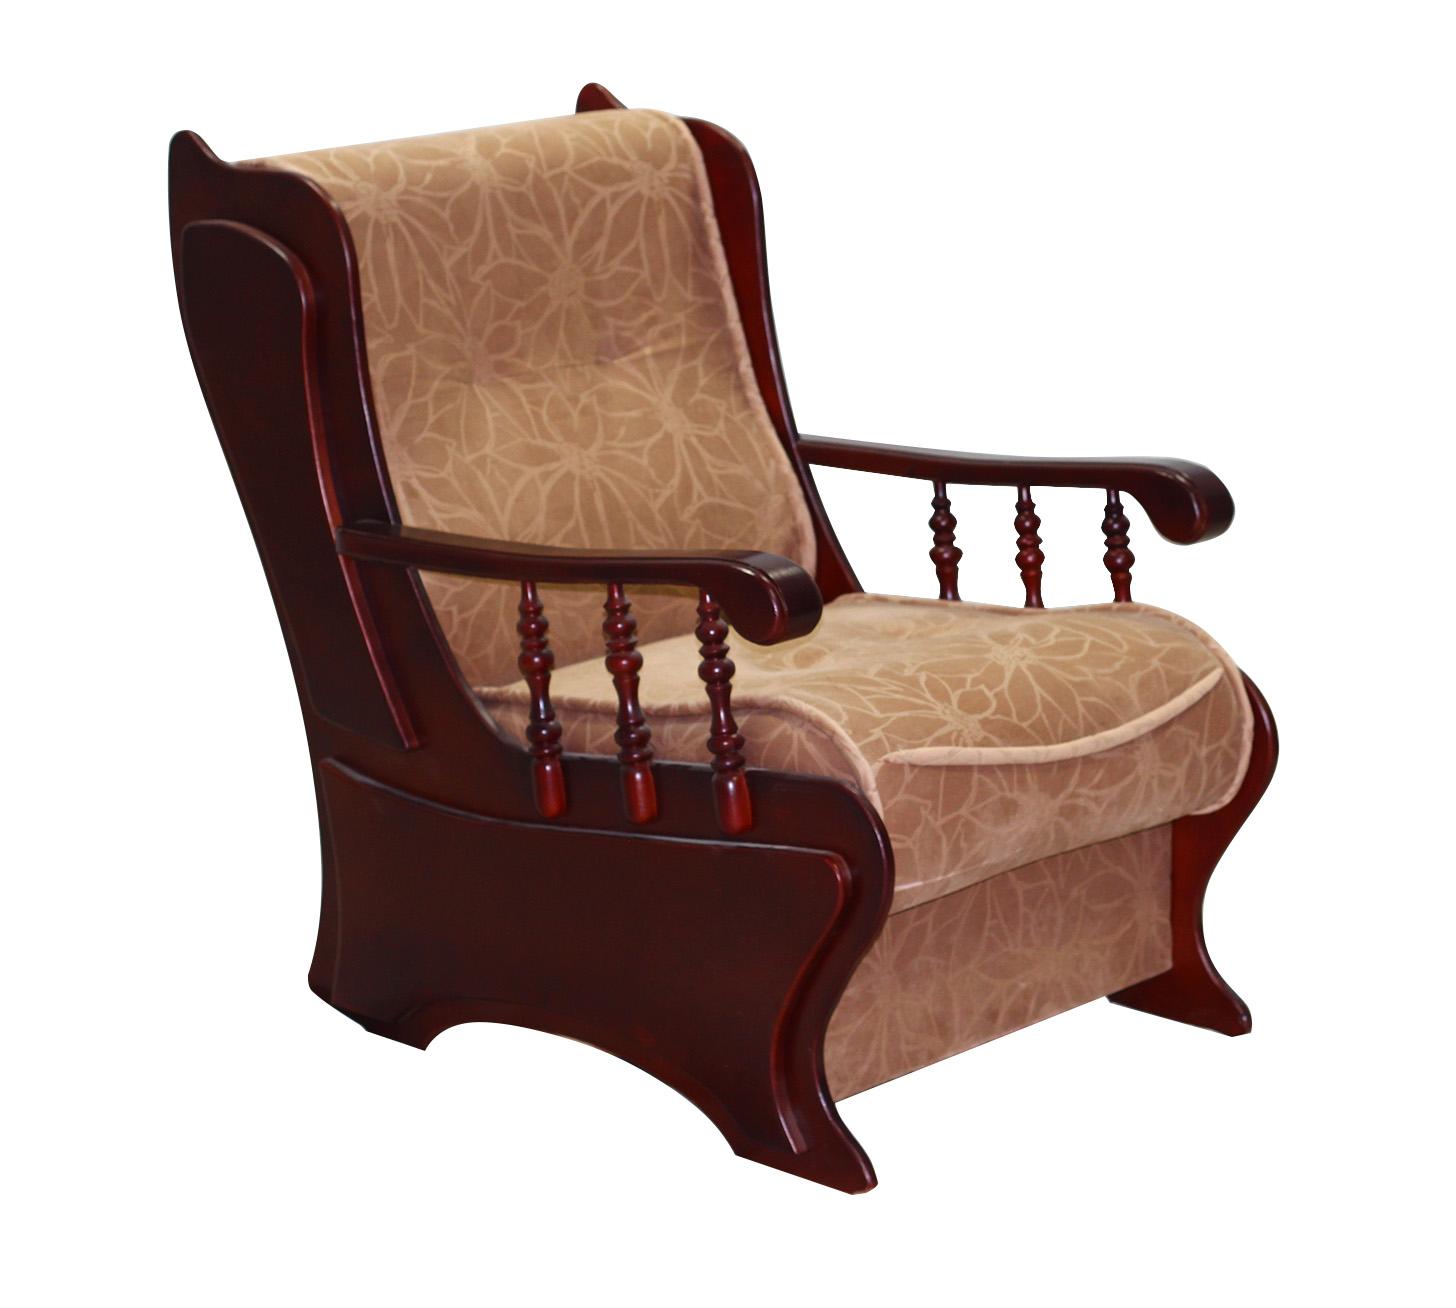 Кресло для отдыха Фараон-Акция акция